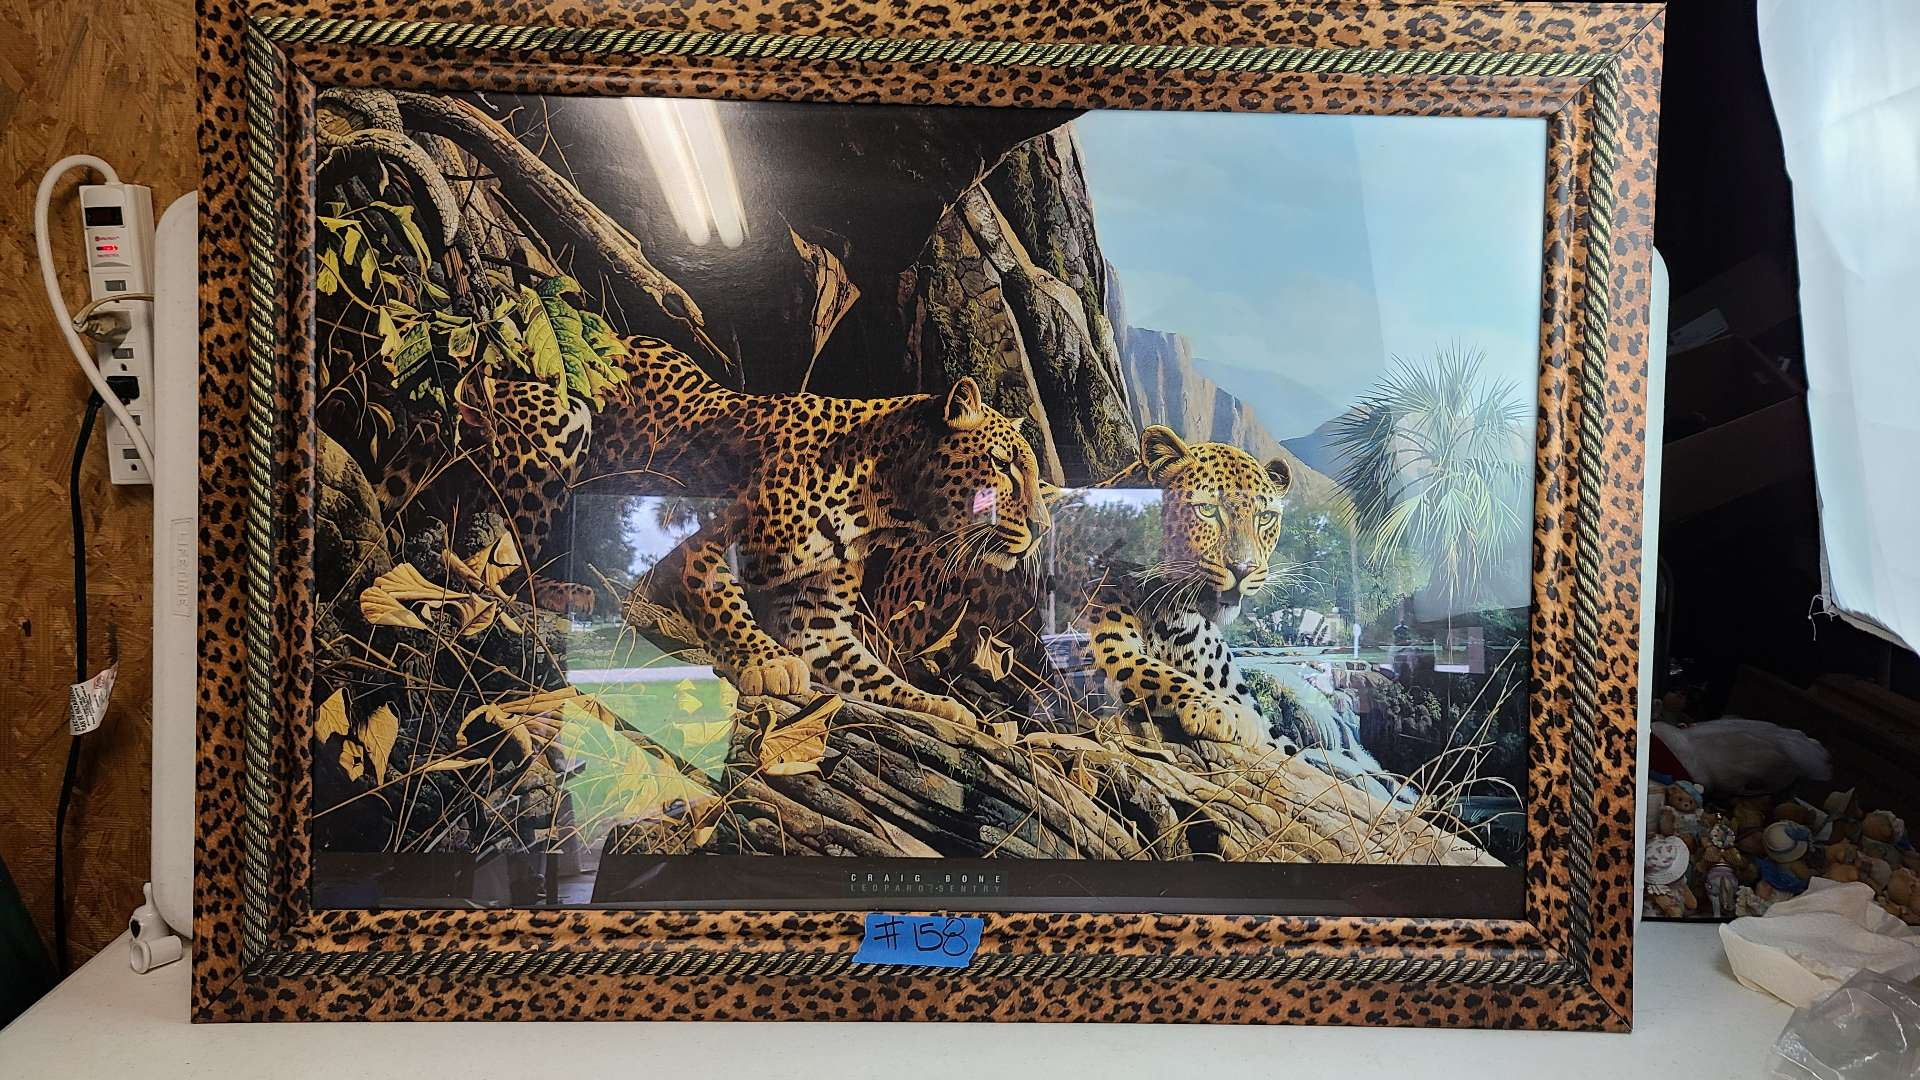 Lot # 158 Cheeta Poster